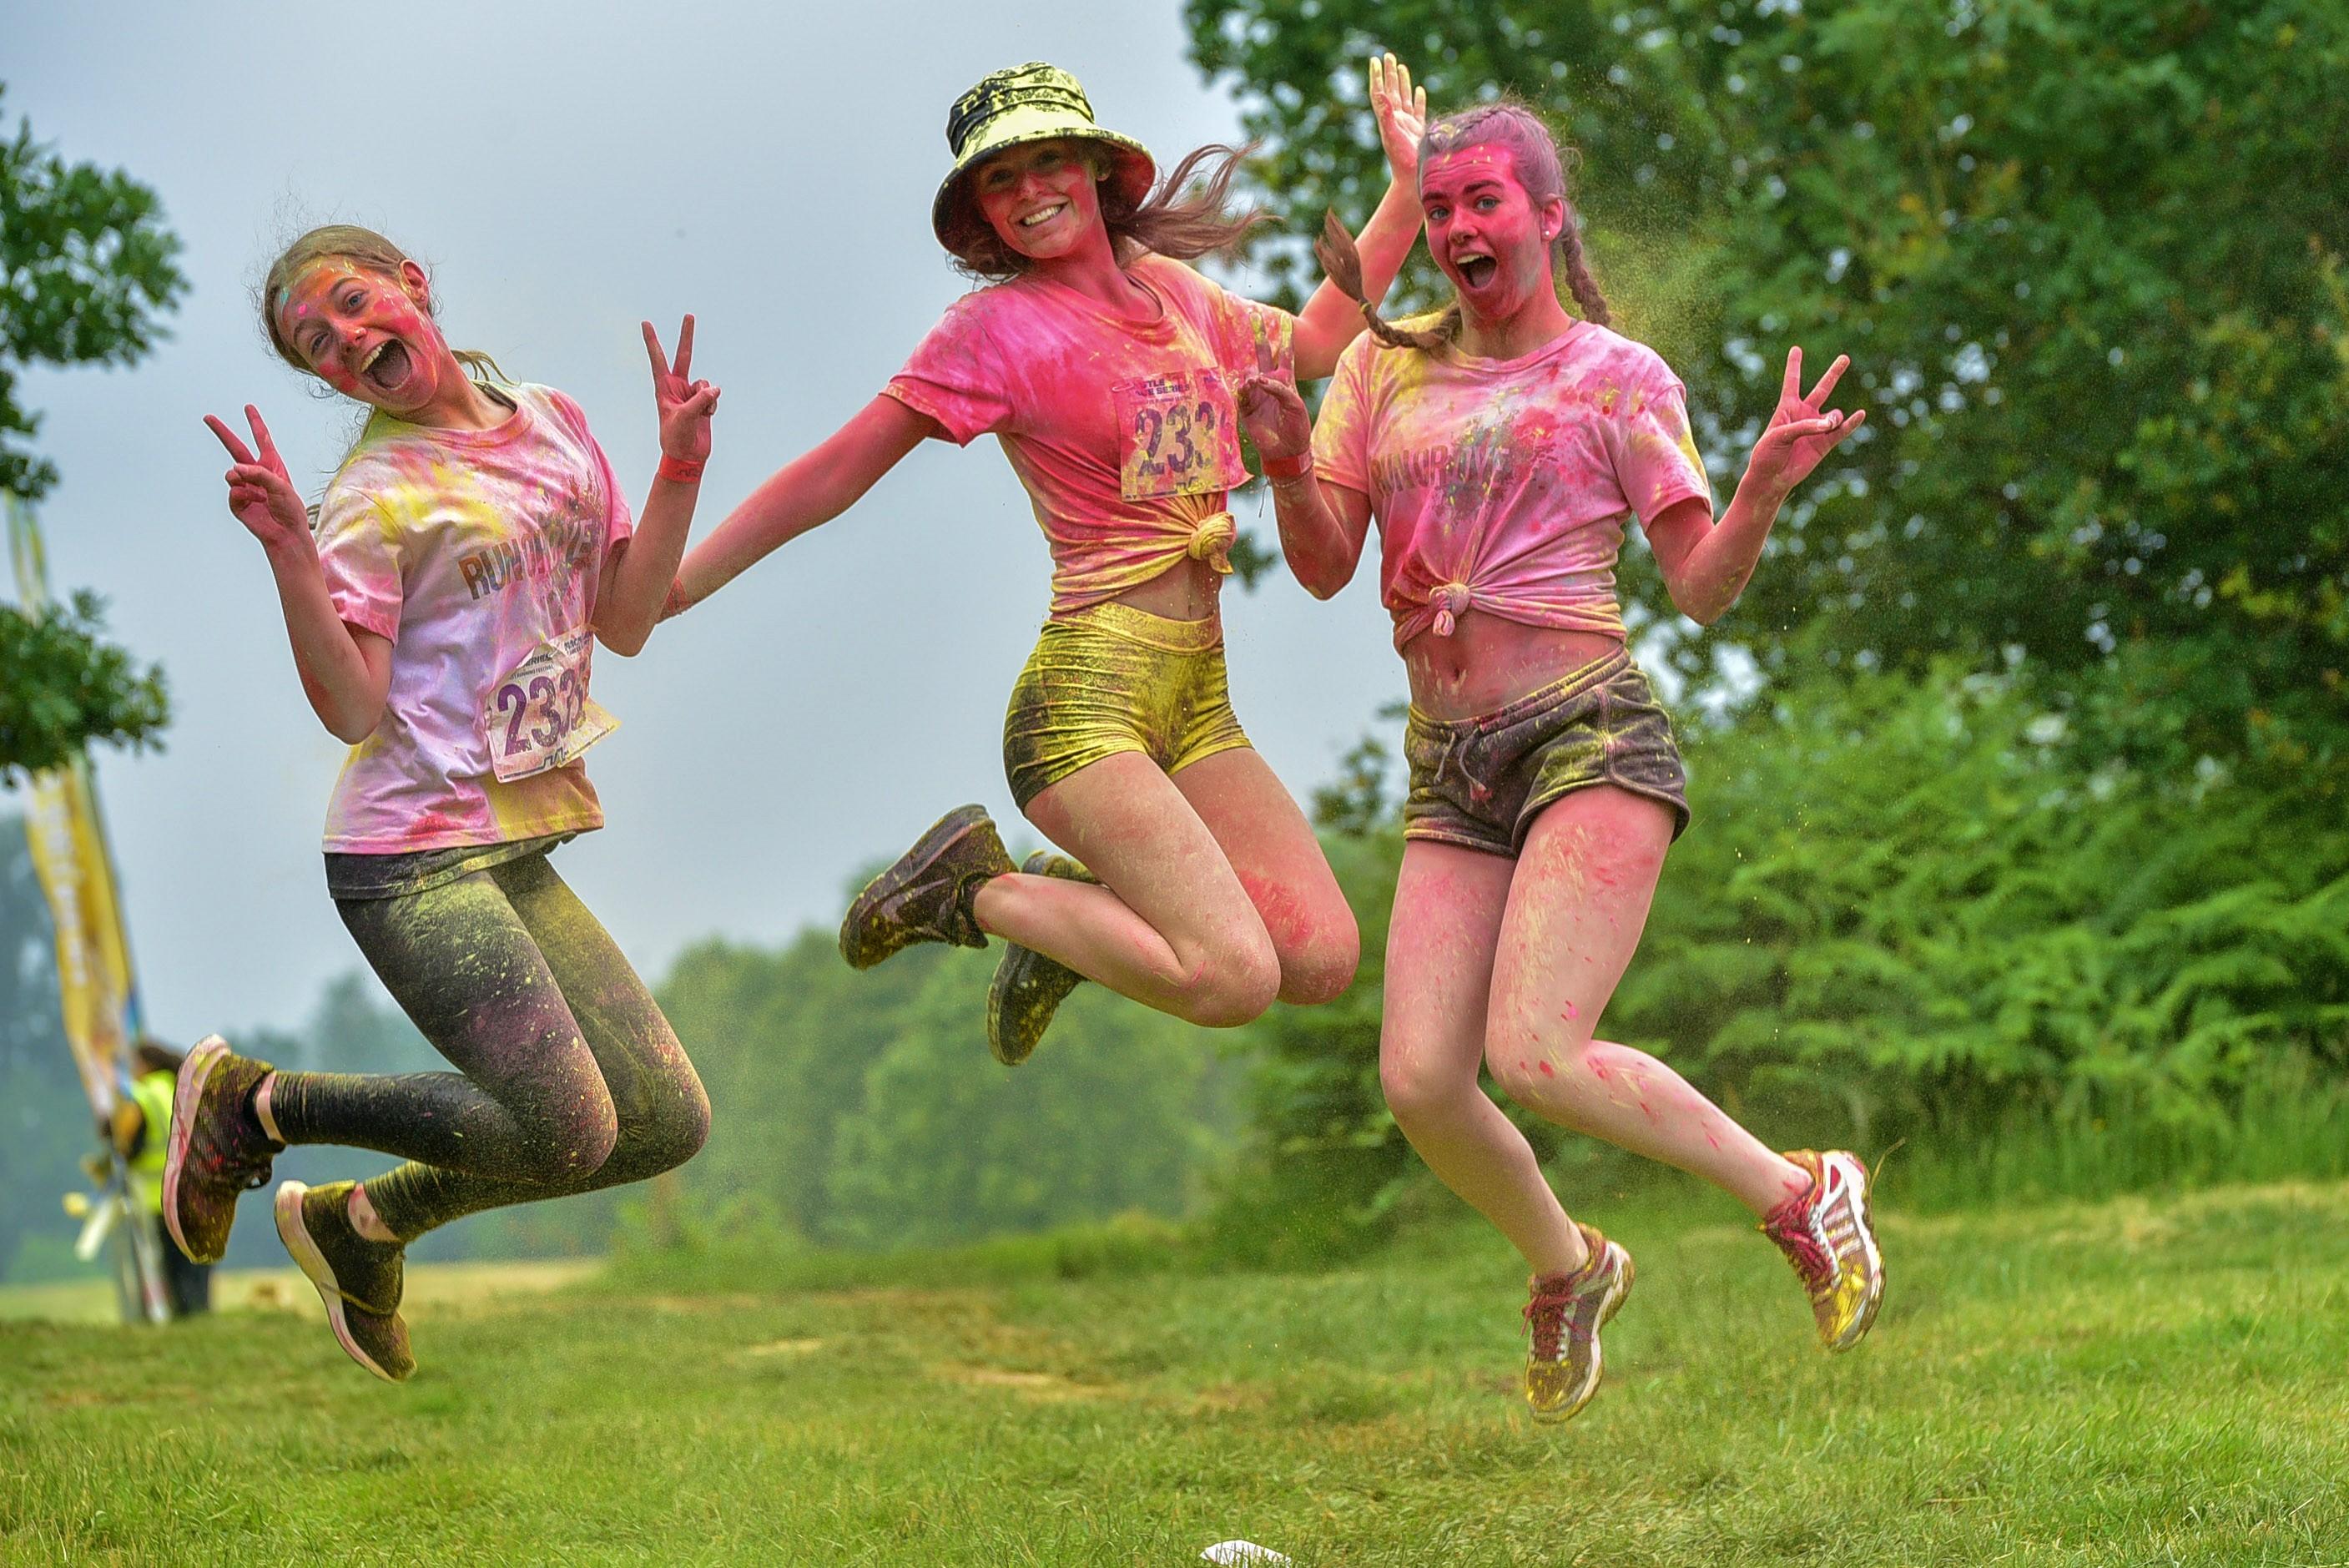 Running Festival at Penshurst Place - cover image